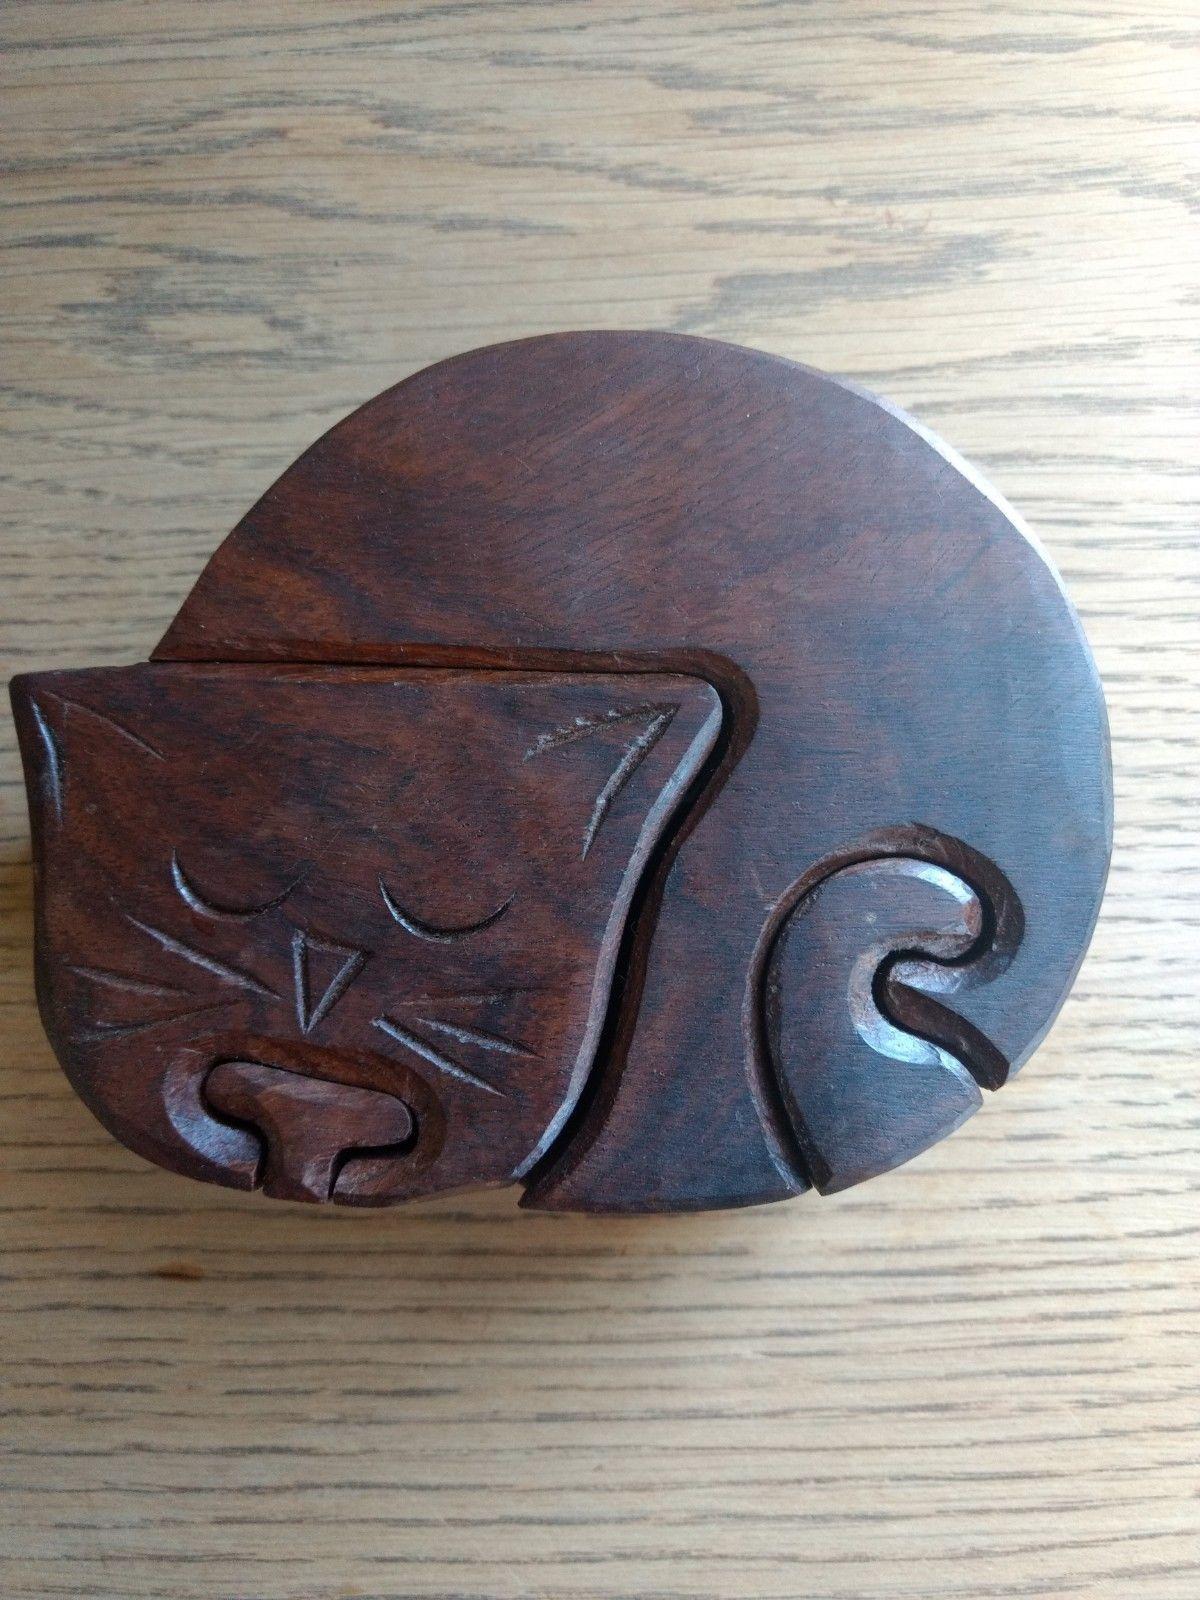 CAT SHAPE PUZZLE GAME BOX WITH VAULT TRINKET JEWEL BOX HANDMADE TEAK WOOD